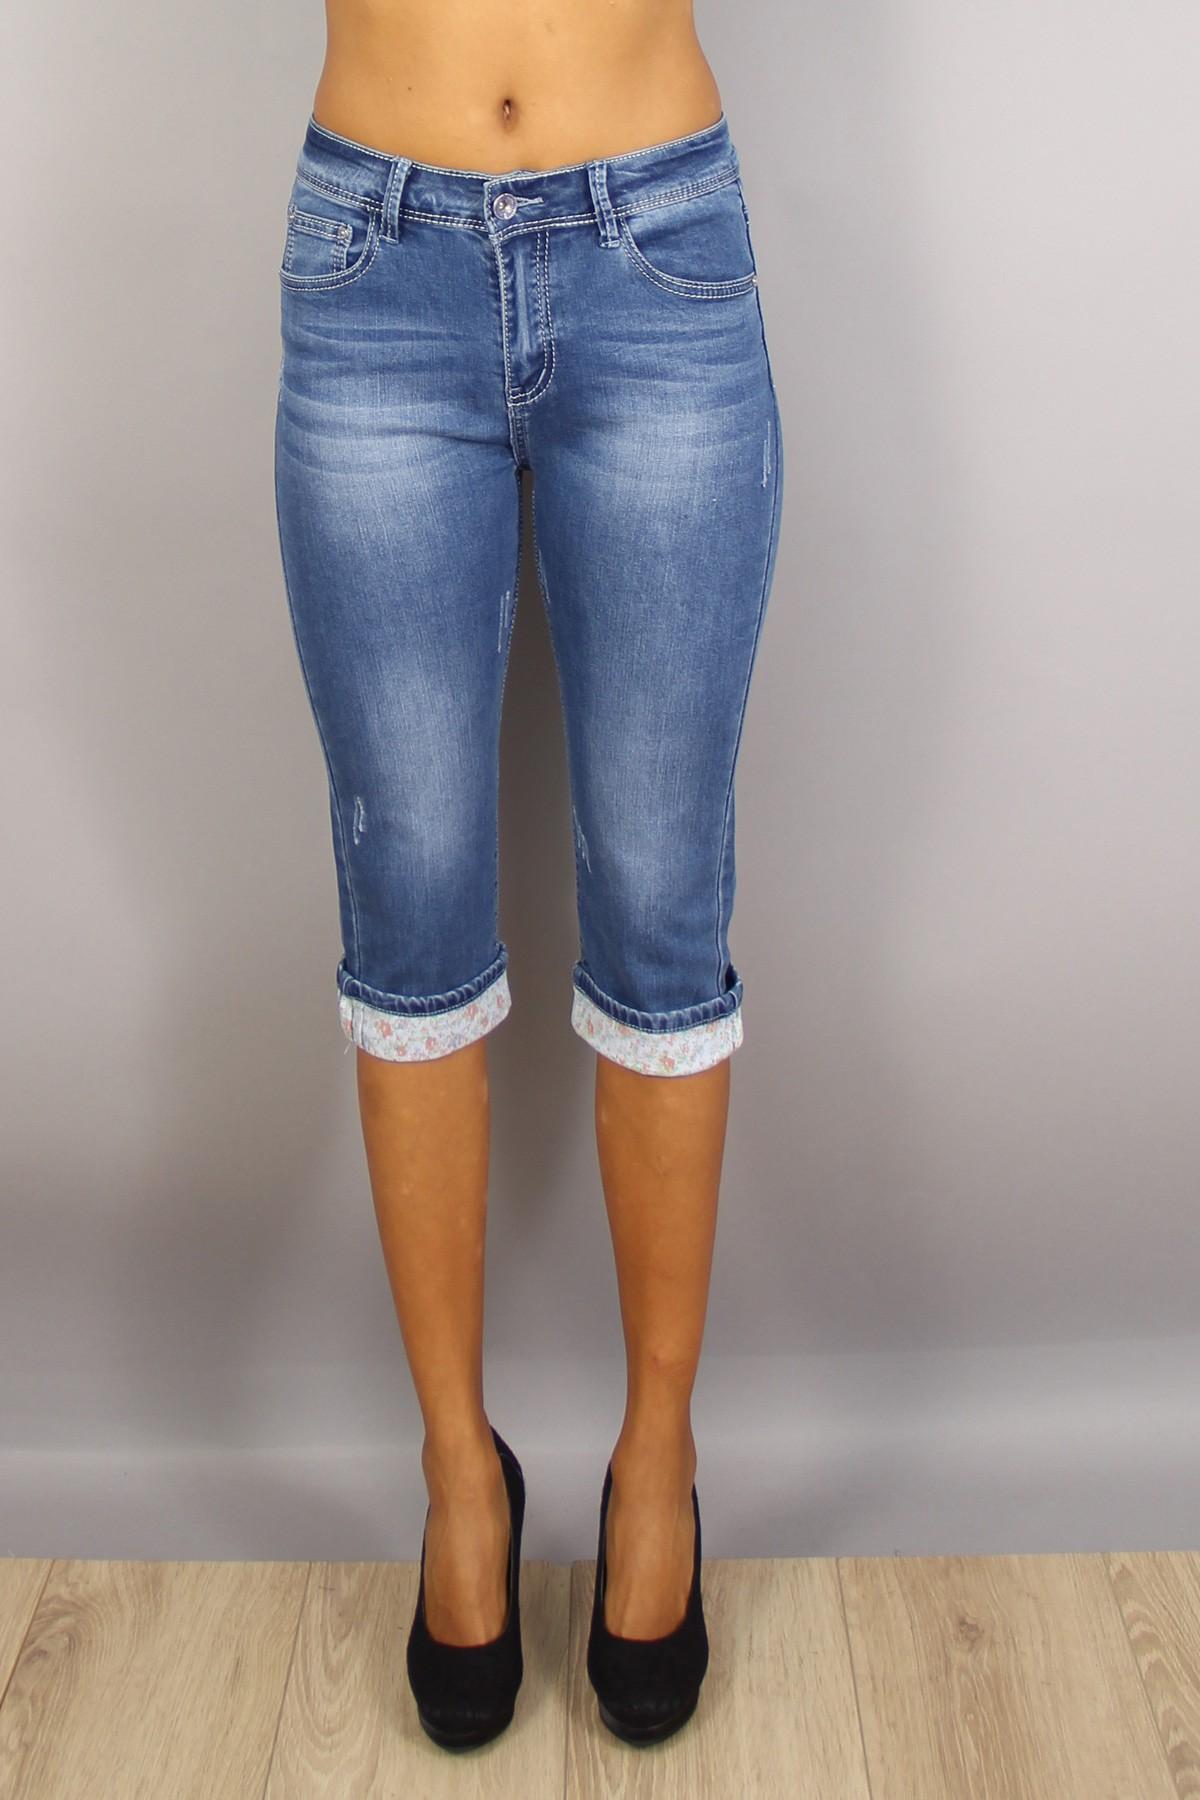 Bermuda jean femme taille haute bleu imprimé Xmax